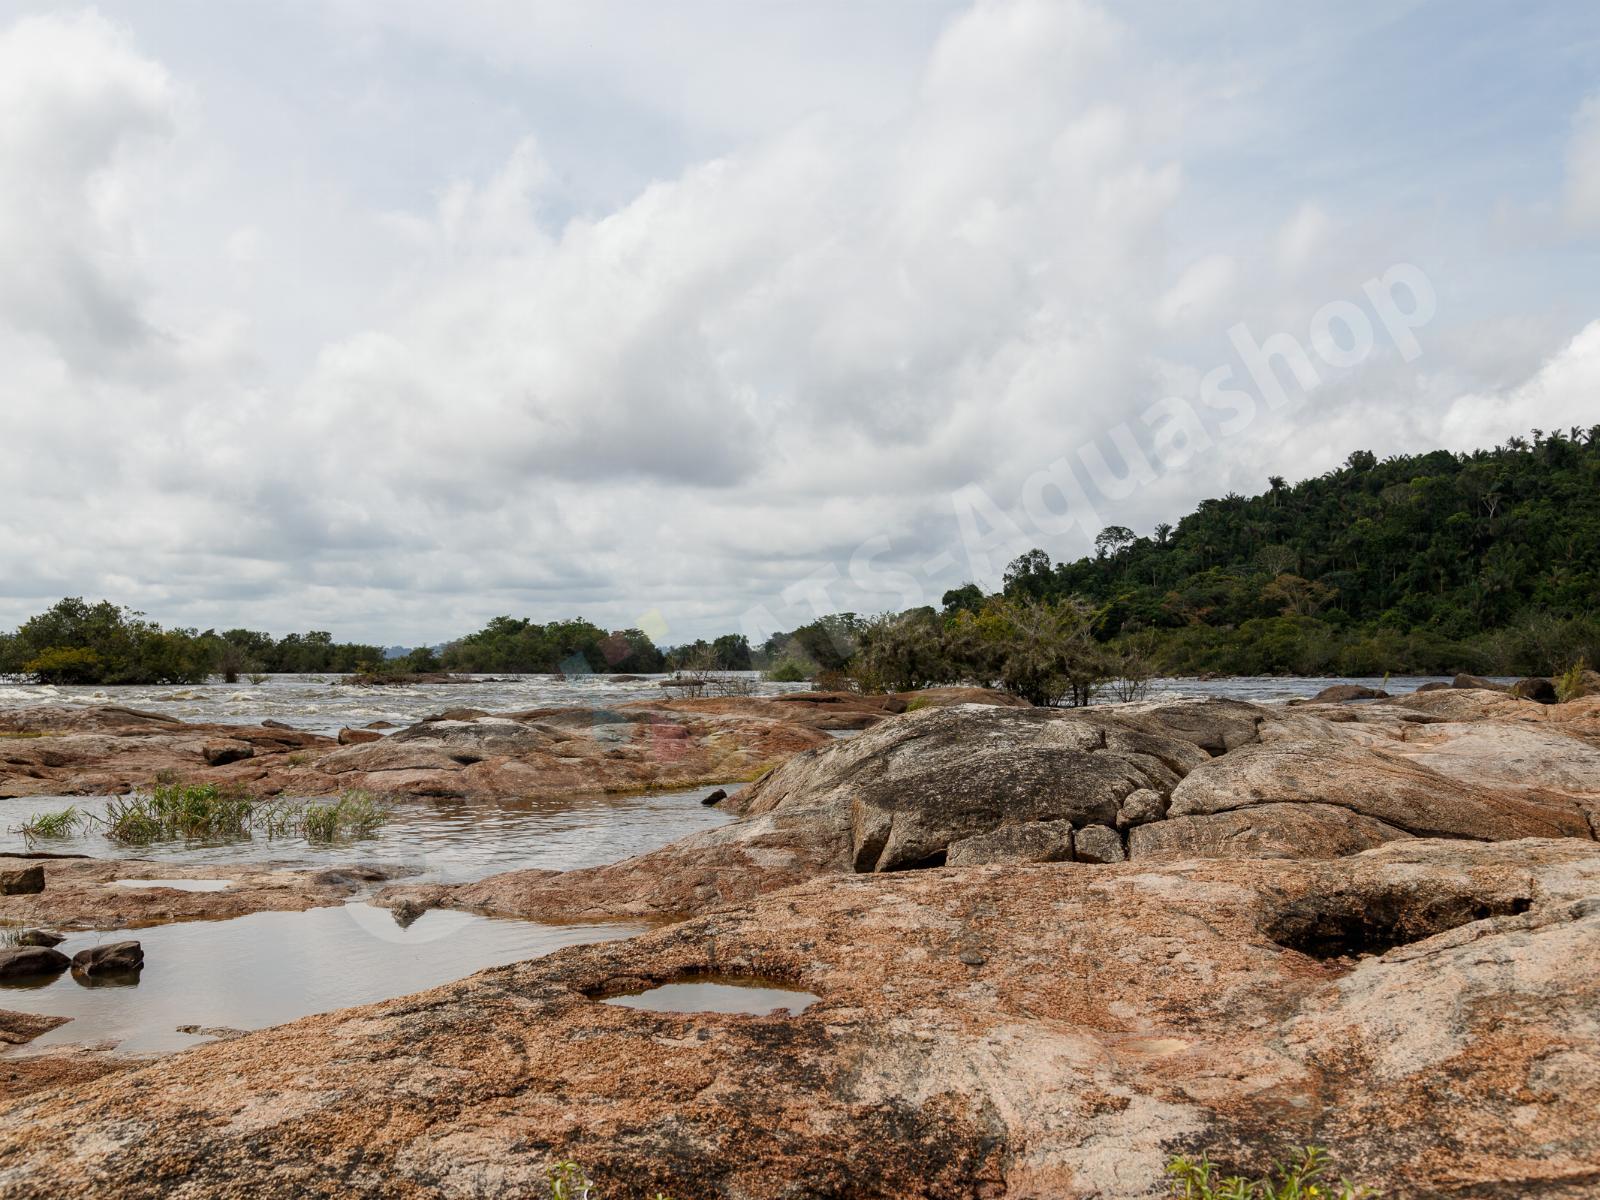 rio xingu cachoeira do jericoa andreas tanke 0198 10